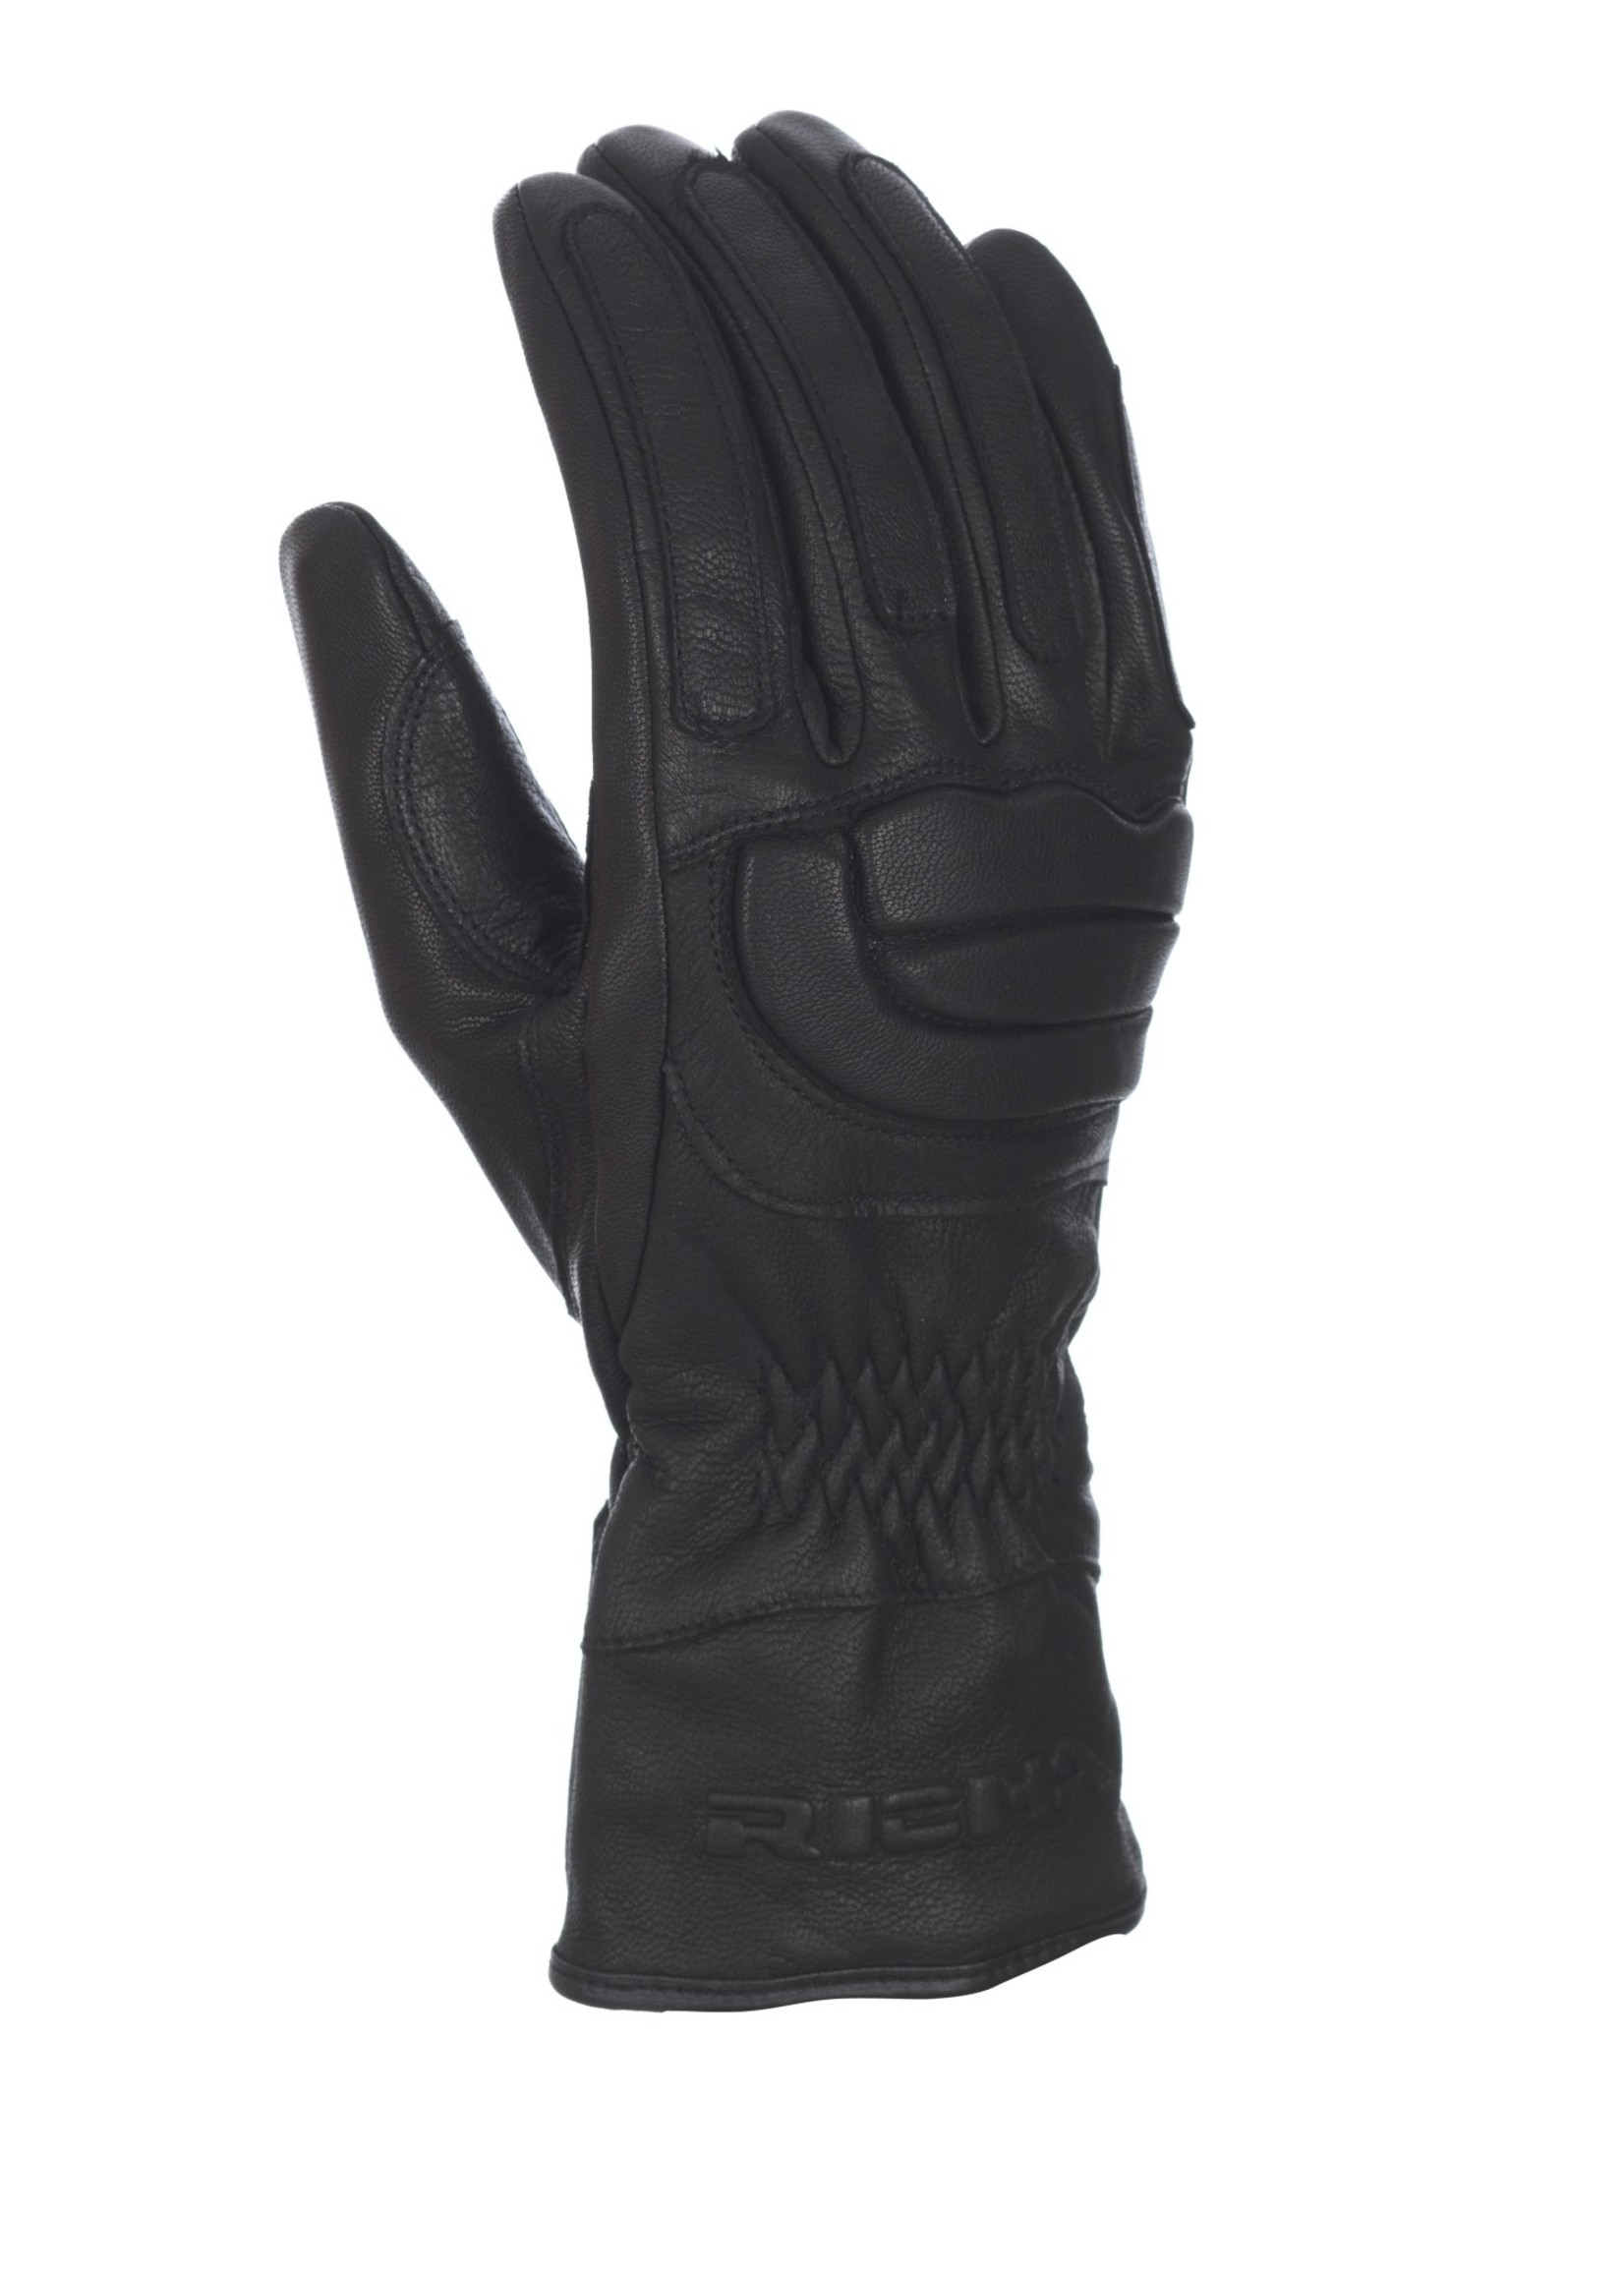 Richa Richa Mid Season Handschoenen